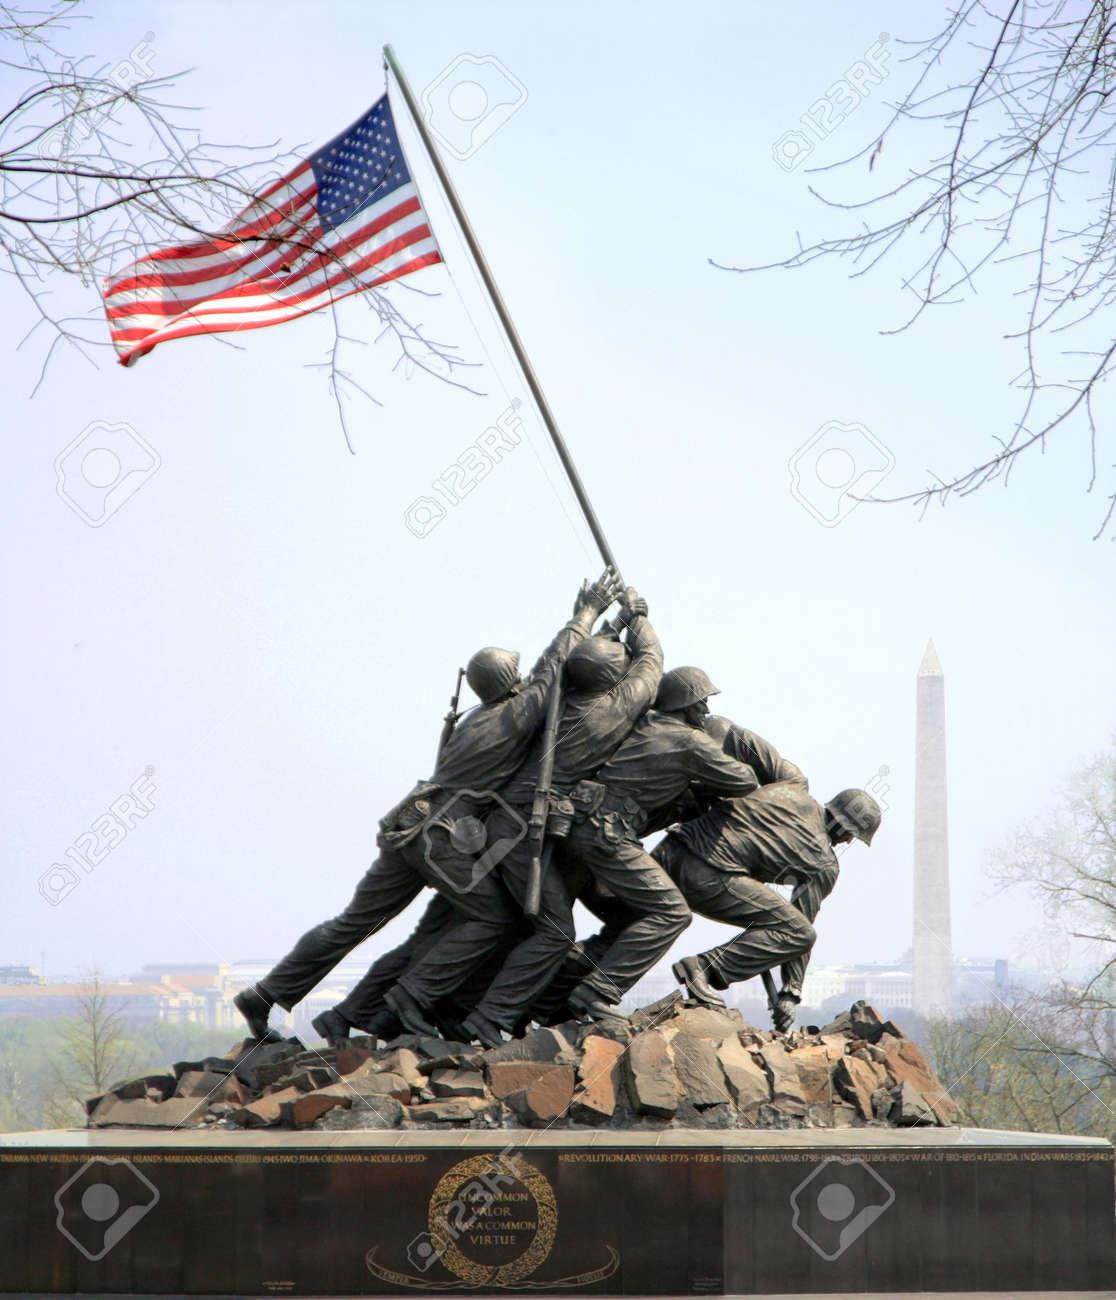 Iwo Jima Memorial in Arlington is dedicated to the U.S. Marines Stock Photo - 373002